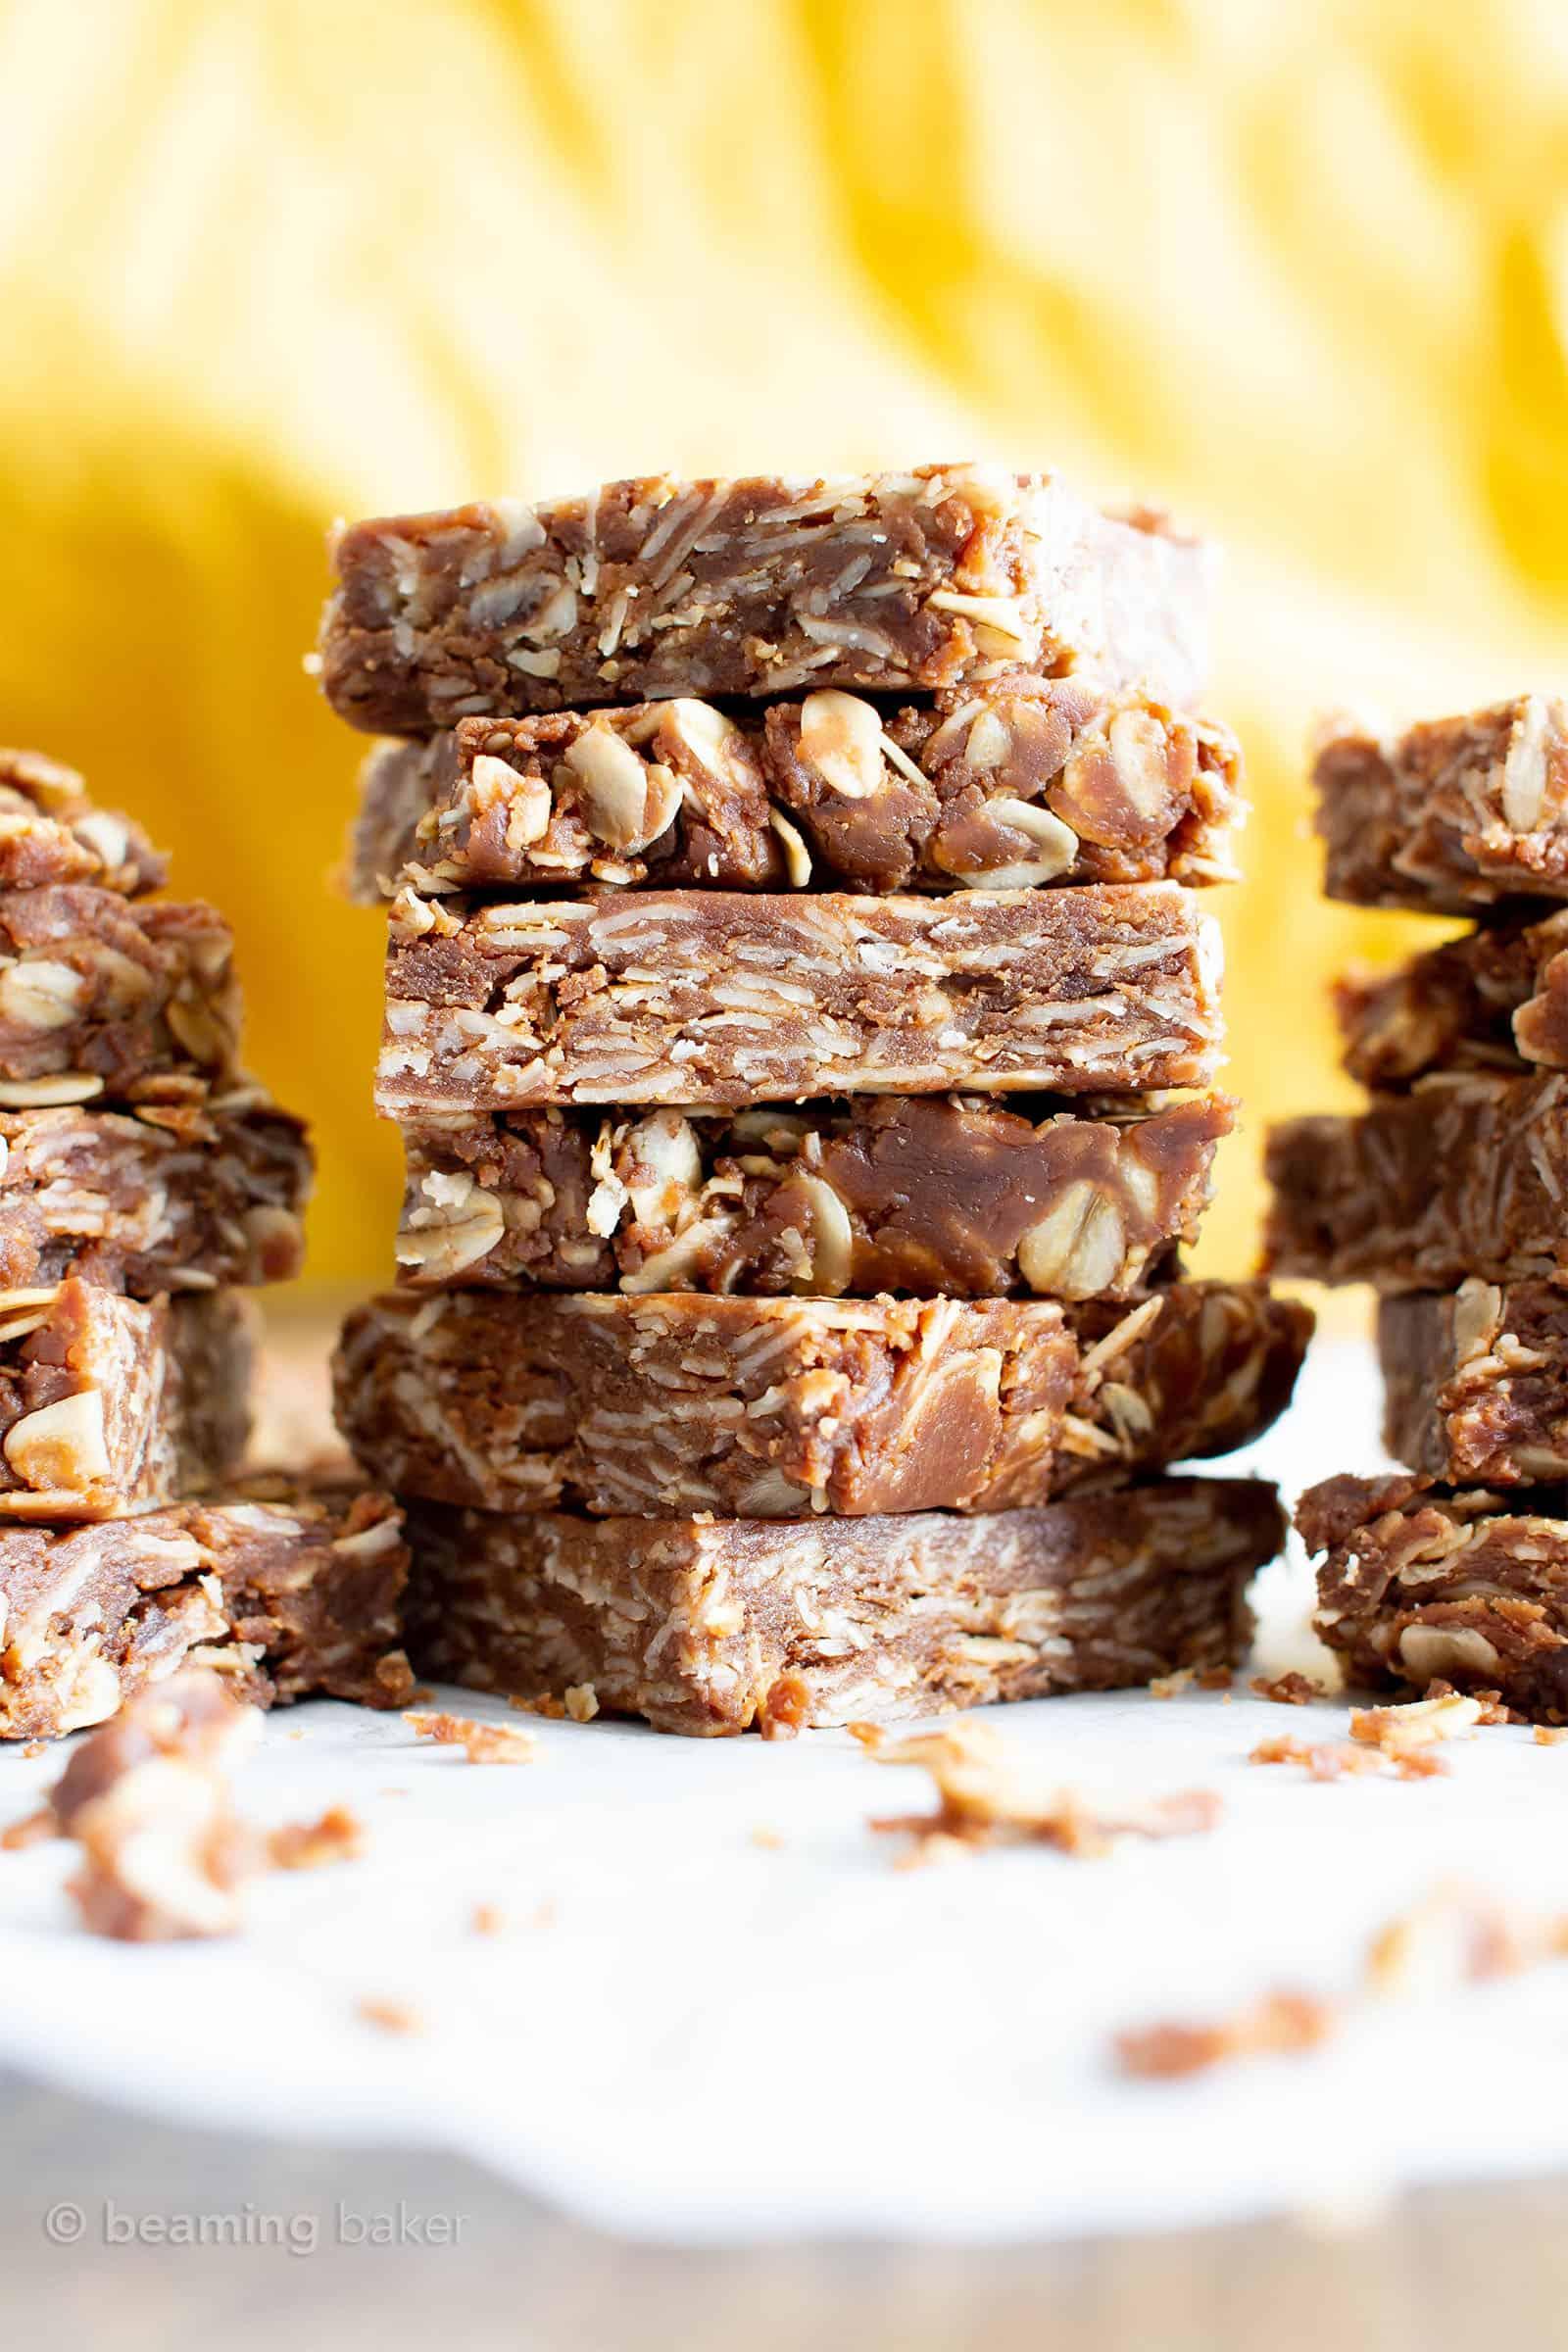 4 Ingredient Chocolate Peanut Butter No Bake Granola Bars: an easy recipe for no bake granola bars bursting with chocolate & peanut butter! Only 4 ingredients for healthy granola bar goodness. #NoBake #GranolaBar #Chocolate #PeanutButter | Recipe at BeamingBaker.com